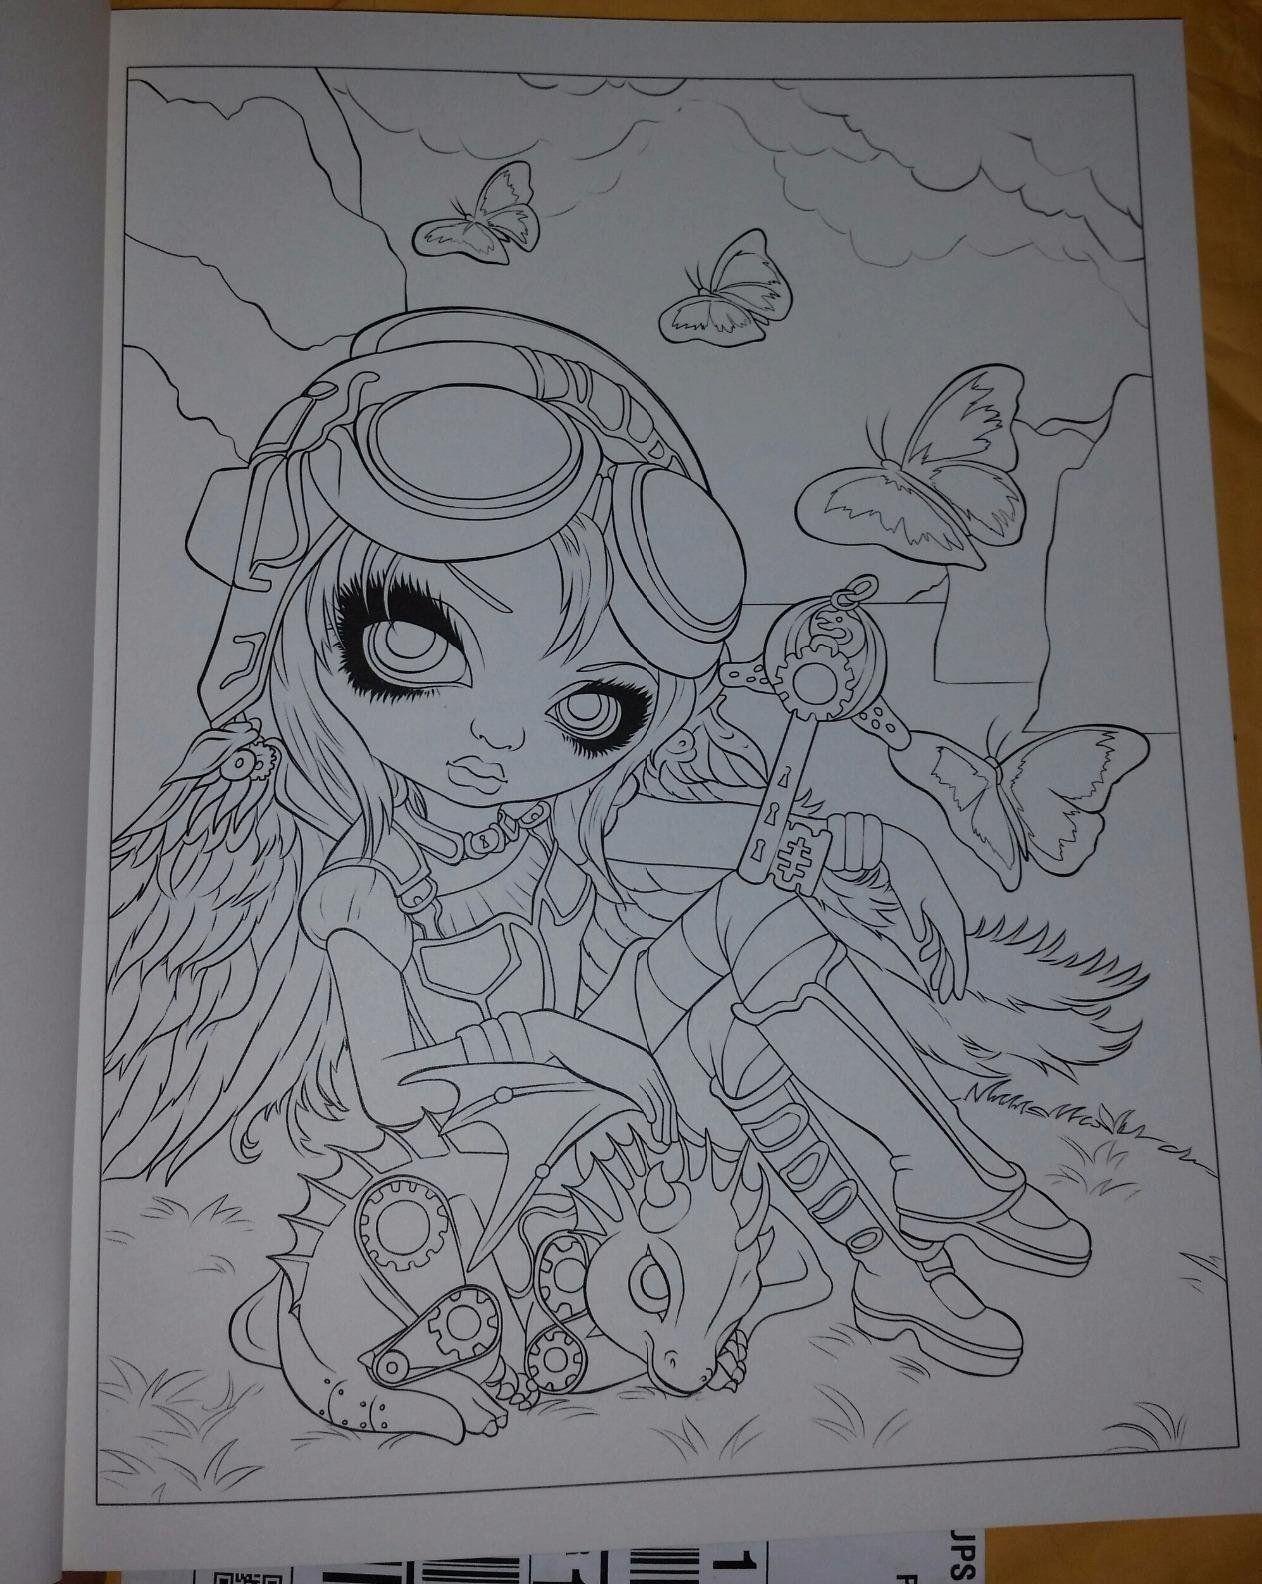 Amazon Com Jasmine Becket Griffith Coloring Book A Fantasy Art Adventure 9780738750019 Jasmin Mandala Coloring Books Coloring Books Cartoon Coloring Pages